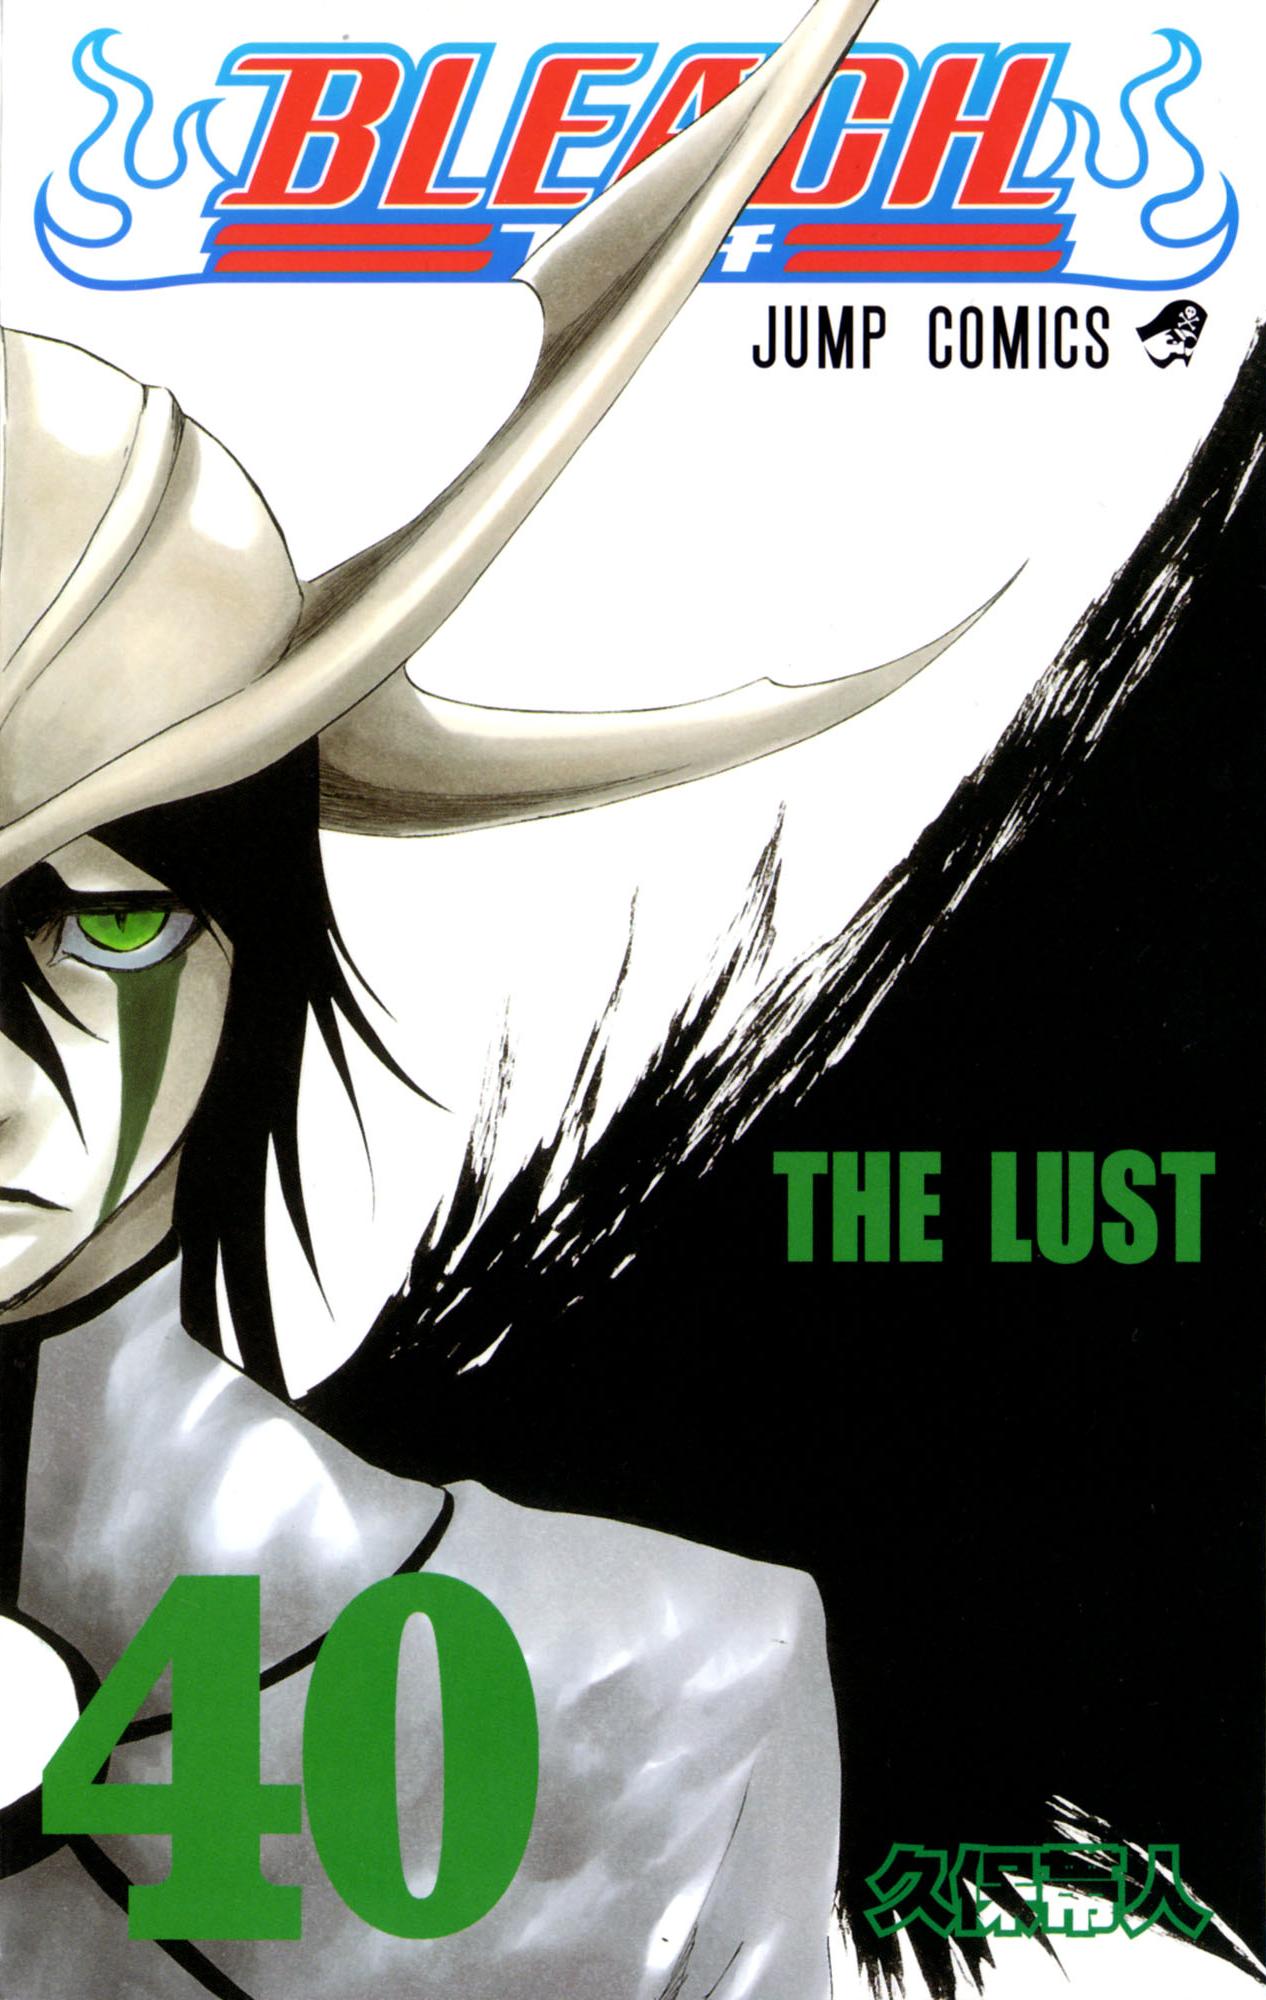 Bleach Manga Volume Covers Read High Quality Bleach Manga on MangaGrounds   Bleach Forums and Fan base